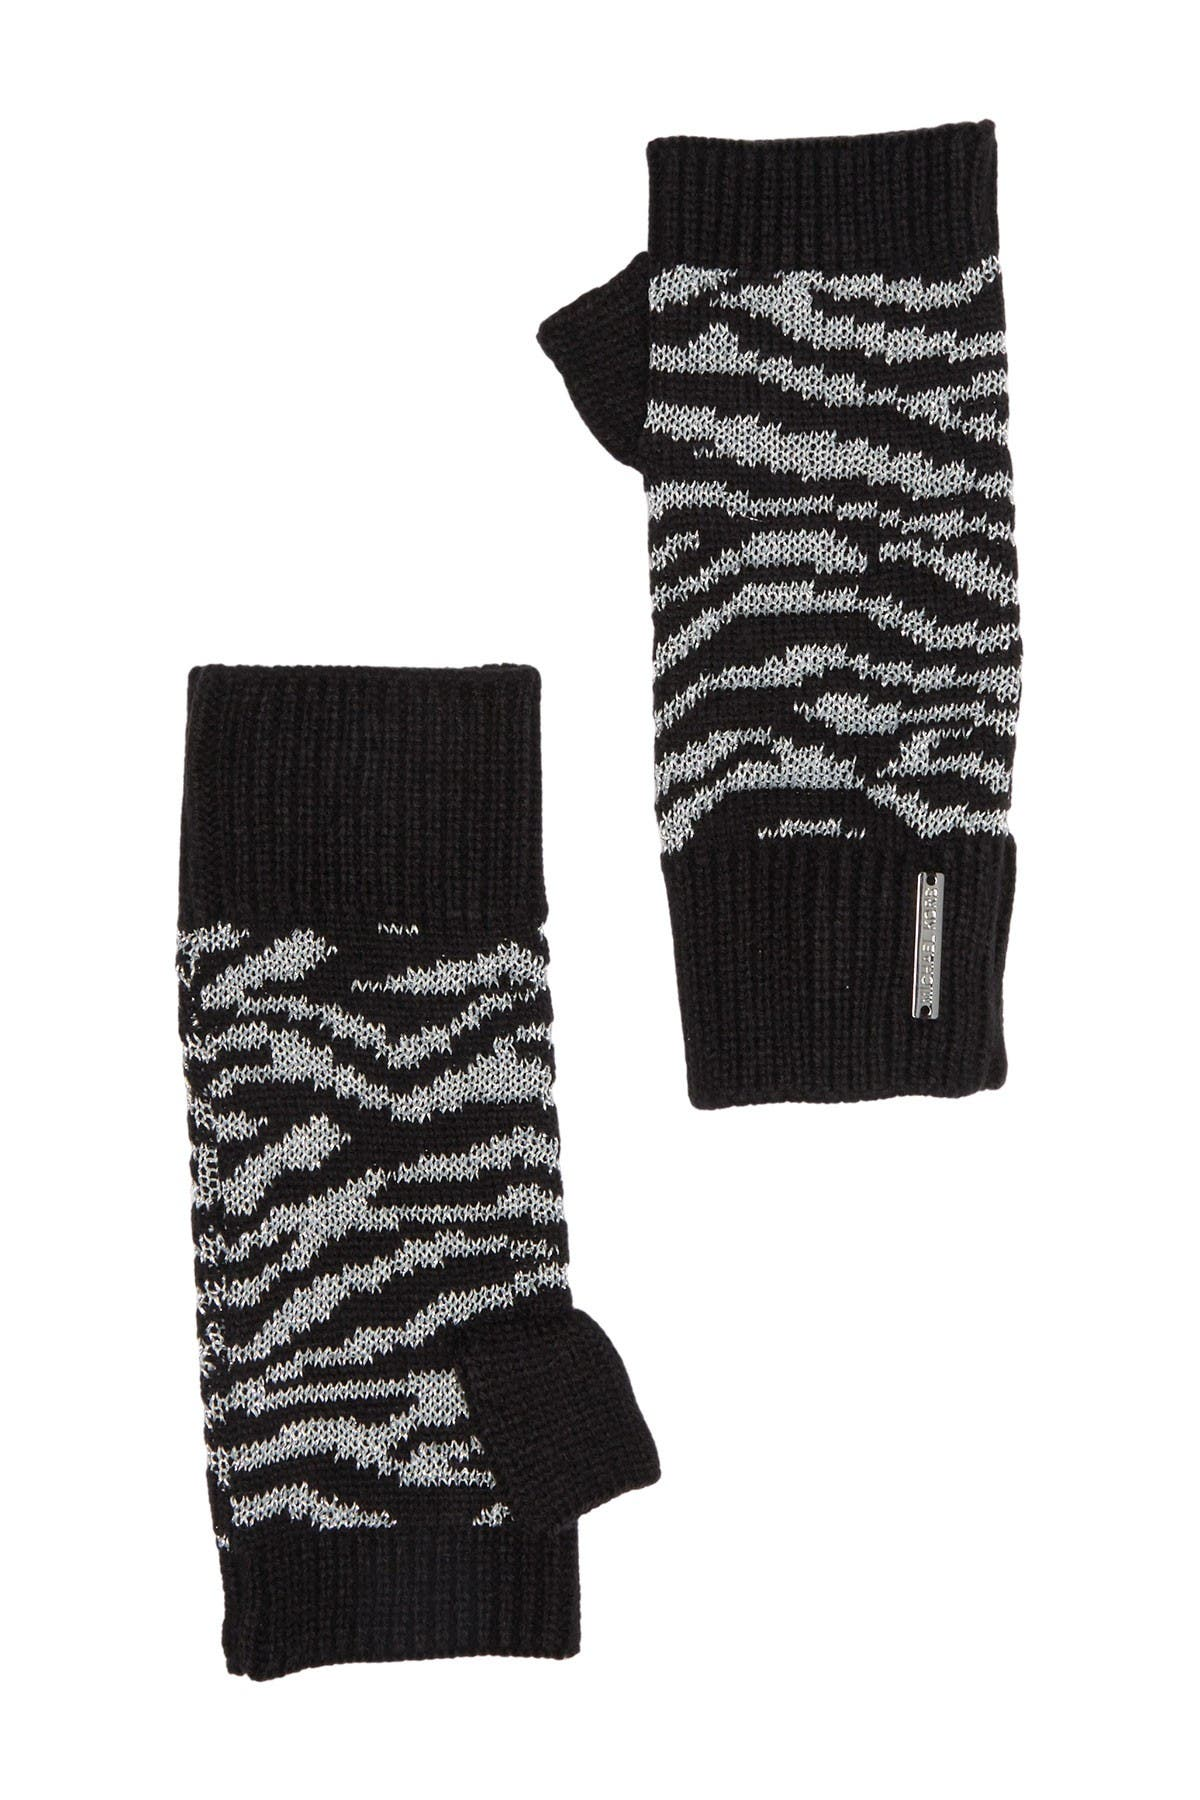 Image of Michael Kors Tiger Stripe Print Metallic Arm Warmer